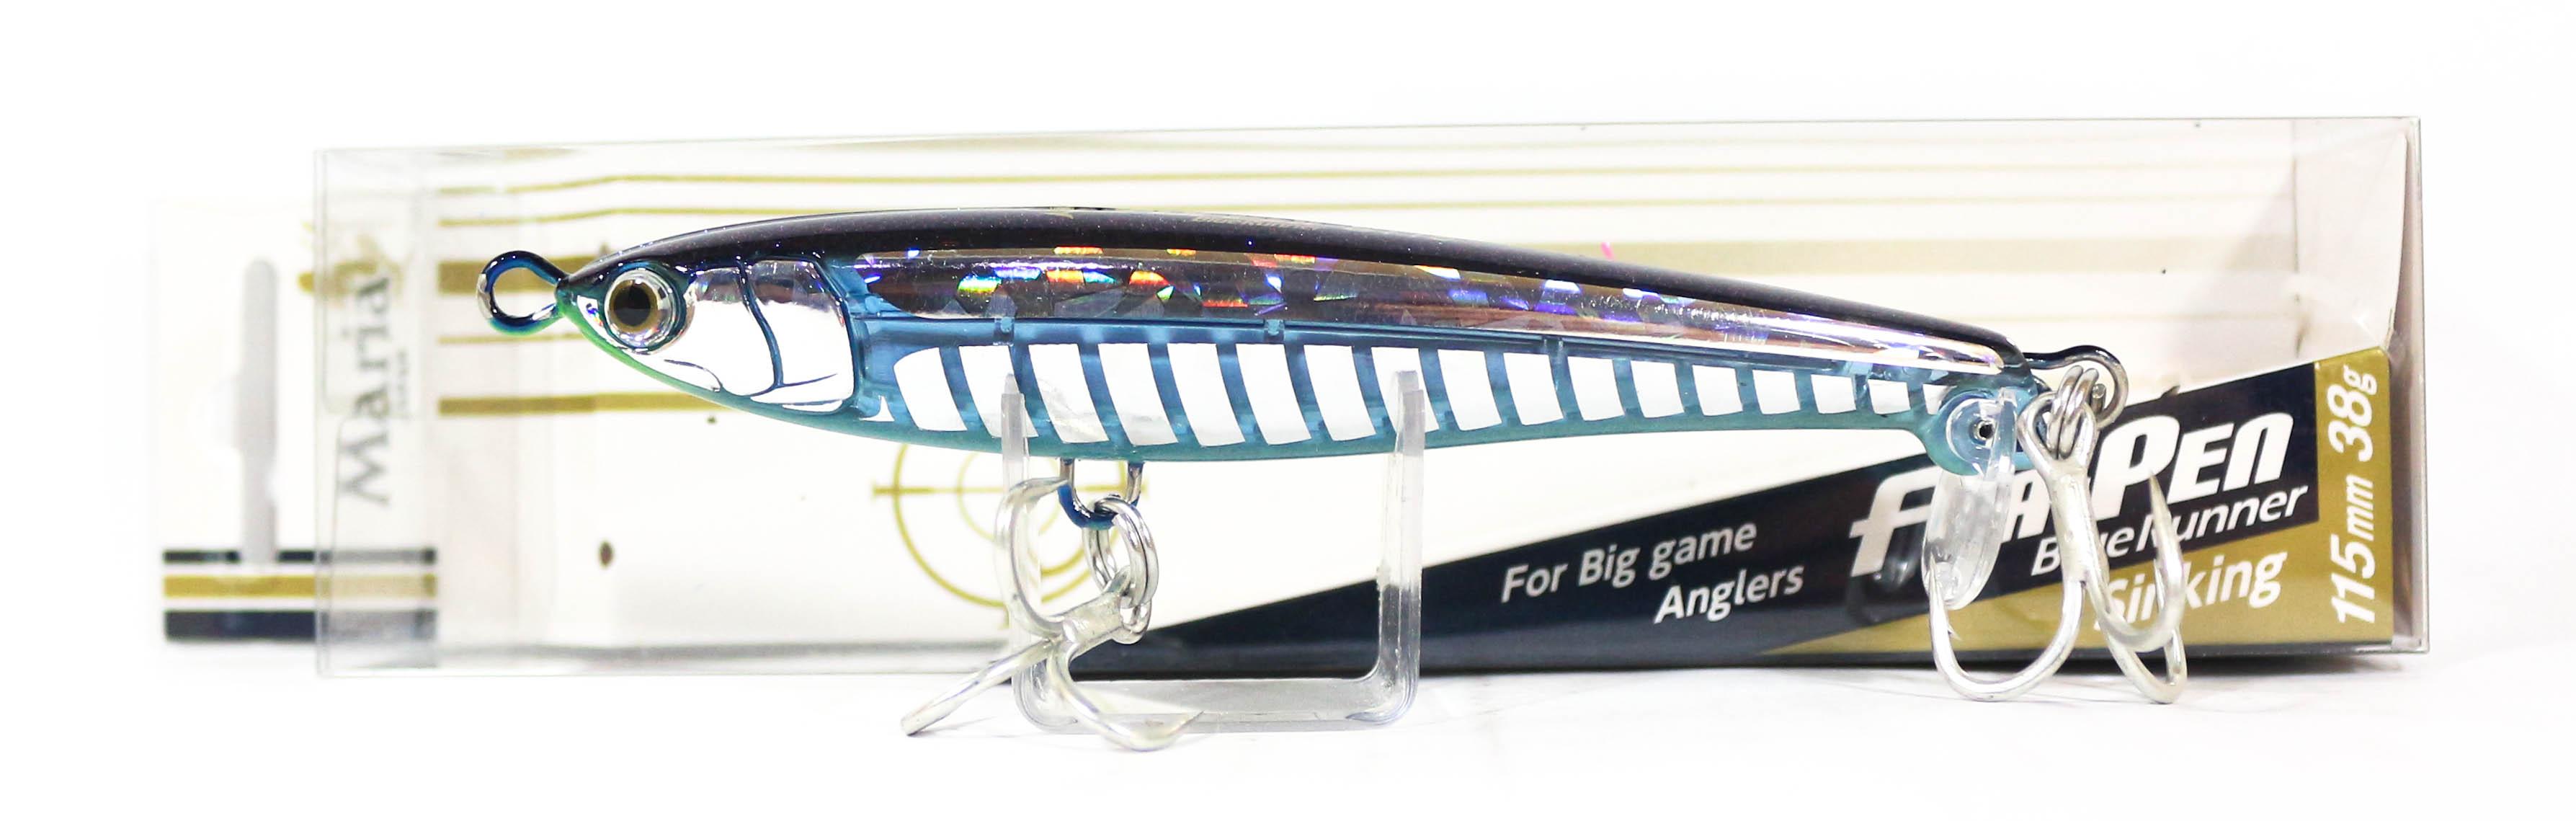 Maria Fla Pen S115 Fluttering Pencil Sinking Lure B24D (2623)